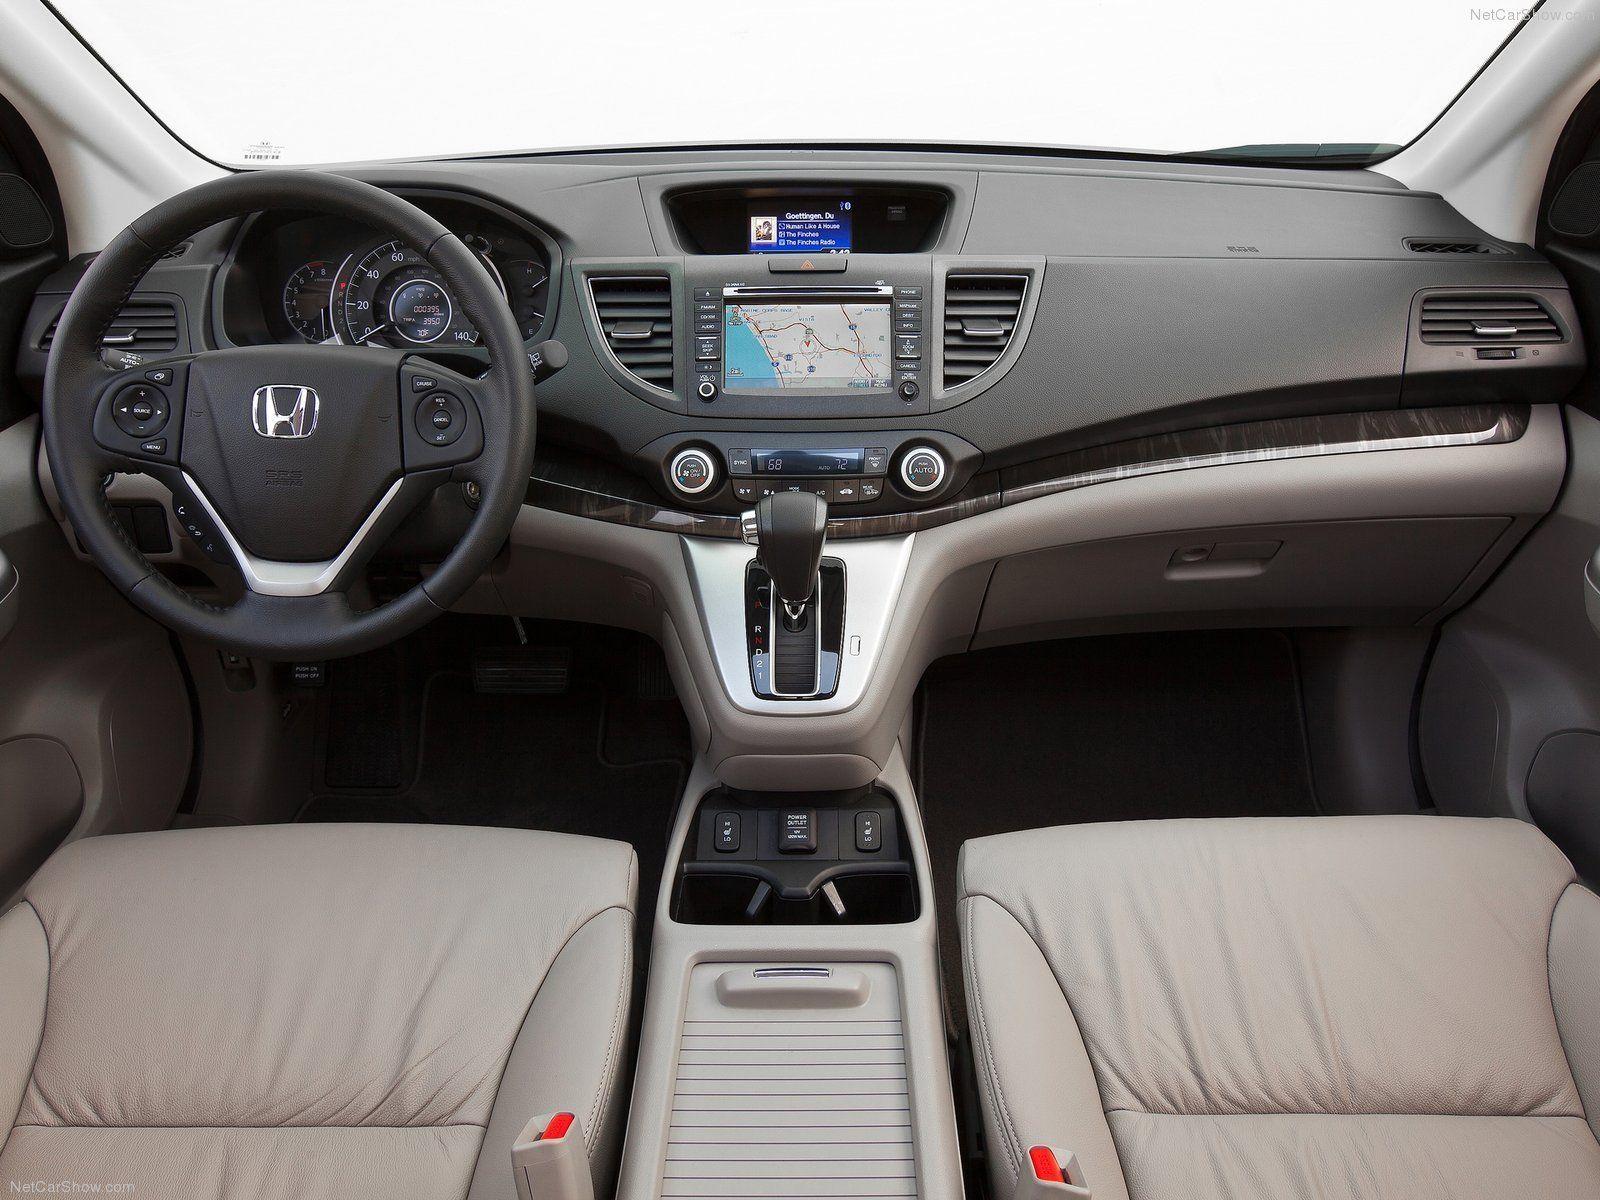 Honda Fit 2021 Release Date Interior In 2020 Honda Jazz Honda Fit Jazz Honda Fit